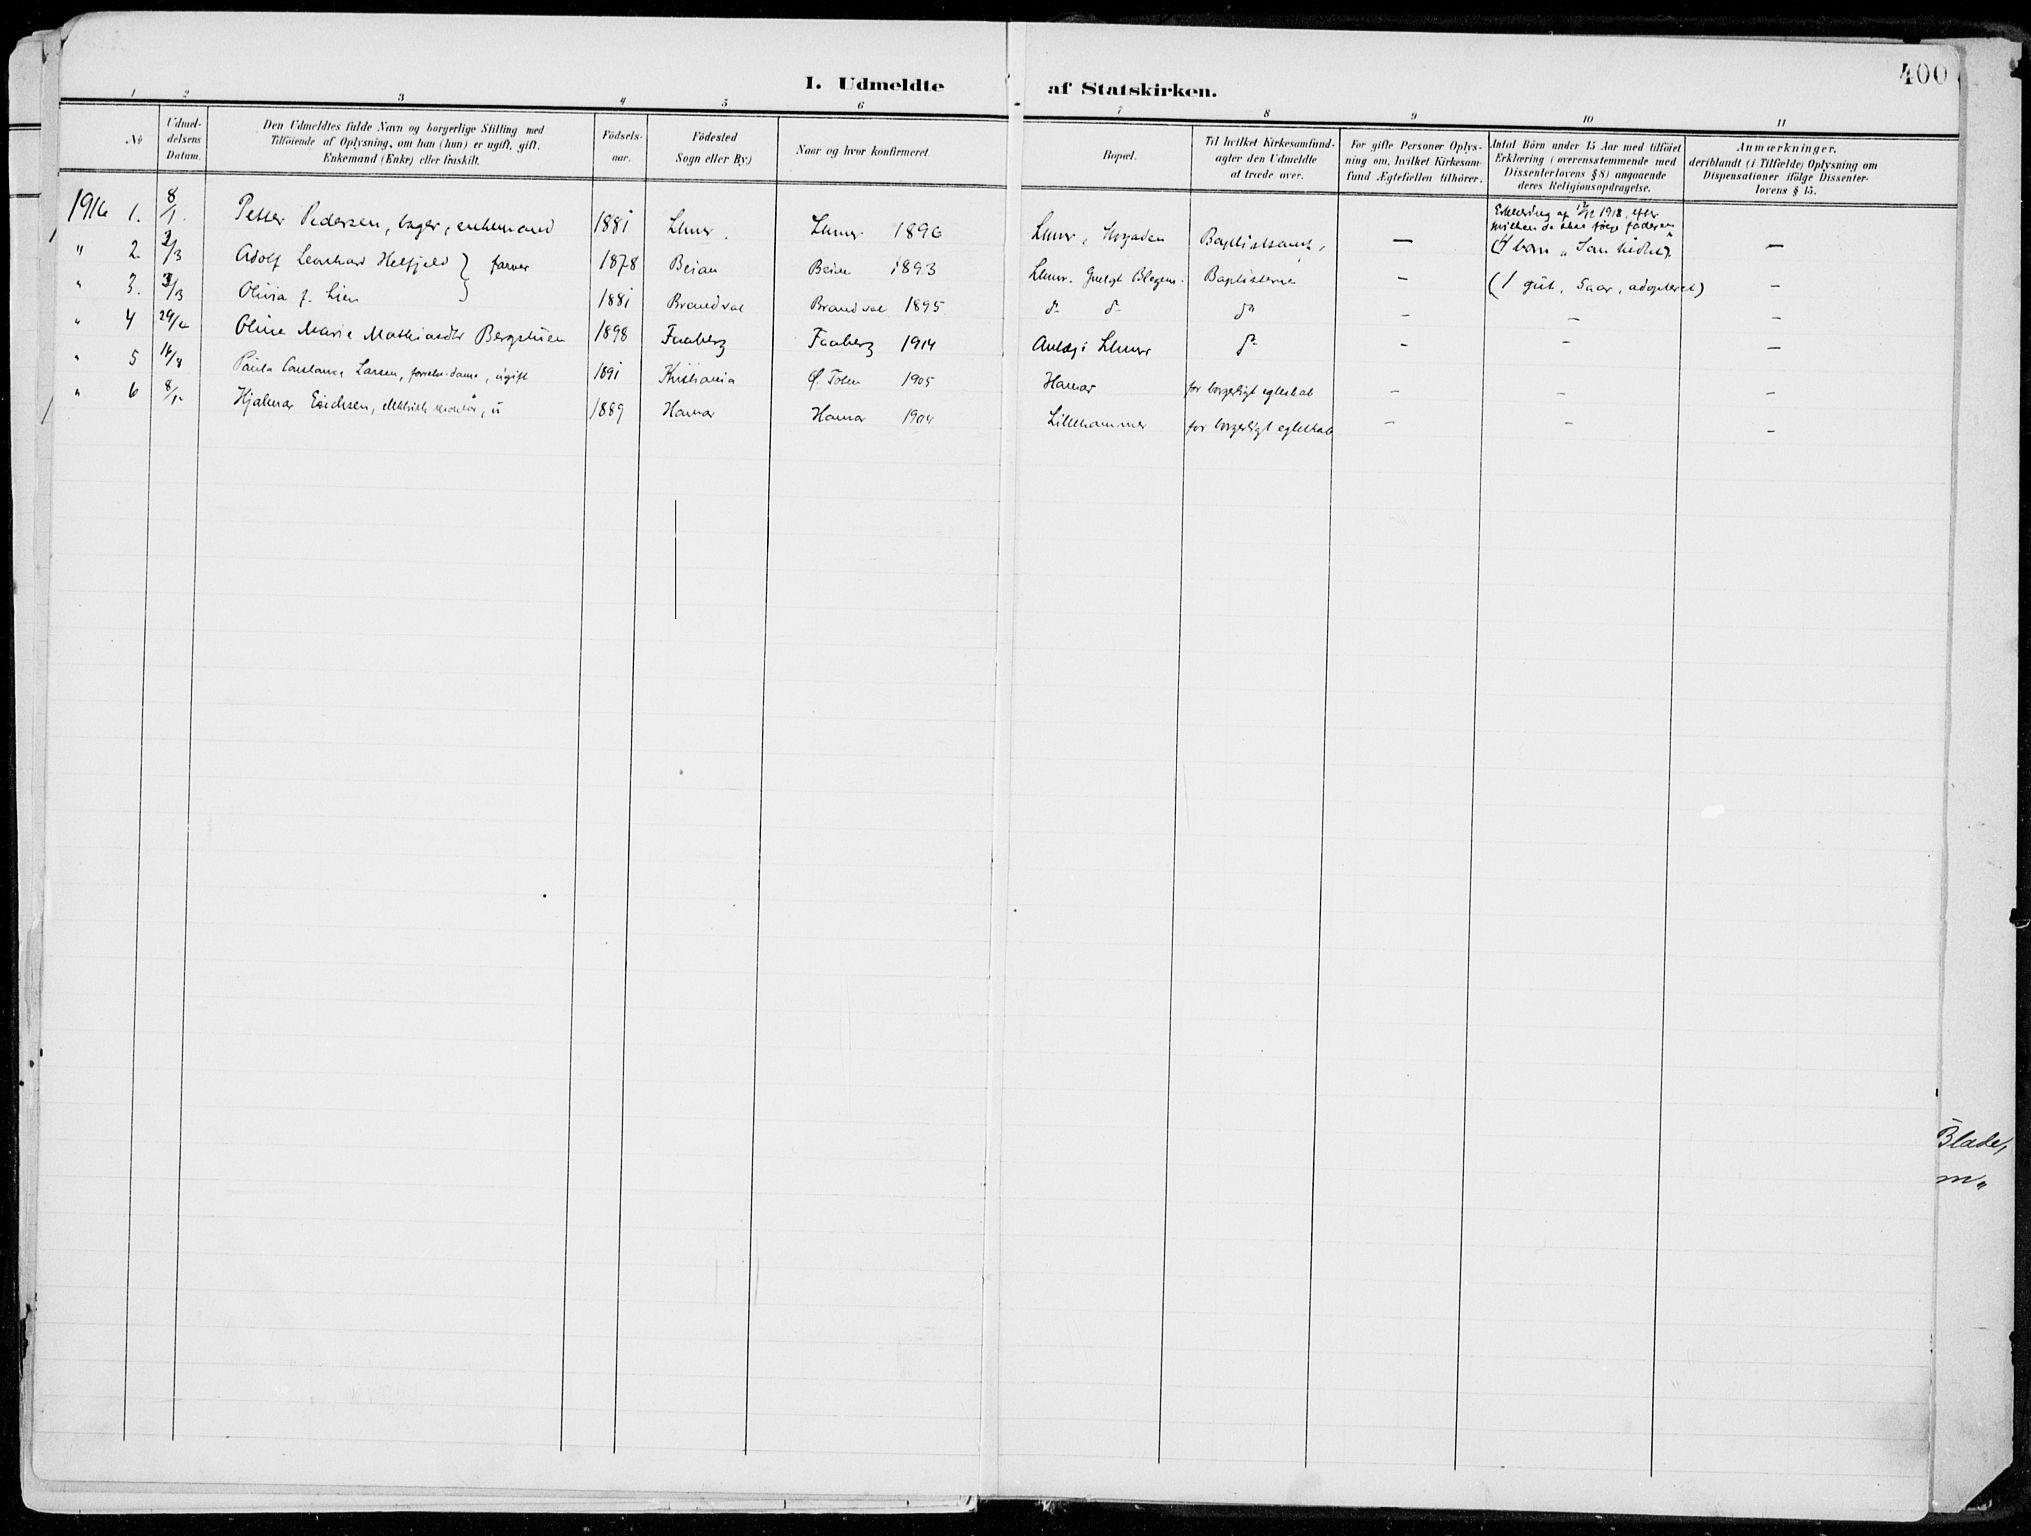 SAH, Lillehammer prestekontor, Ministerialbok nr. 1, 1901-1916, s. 400